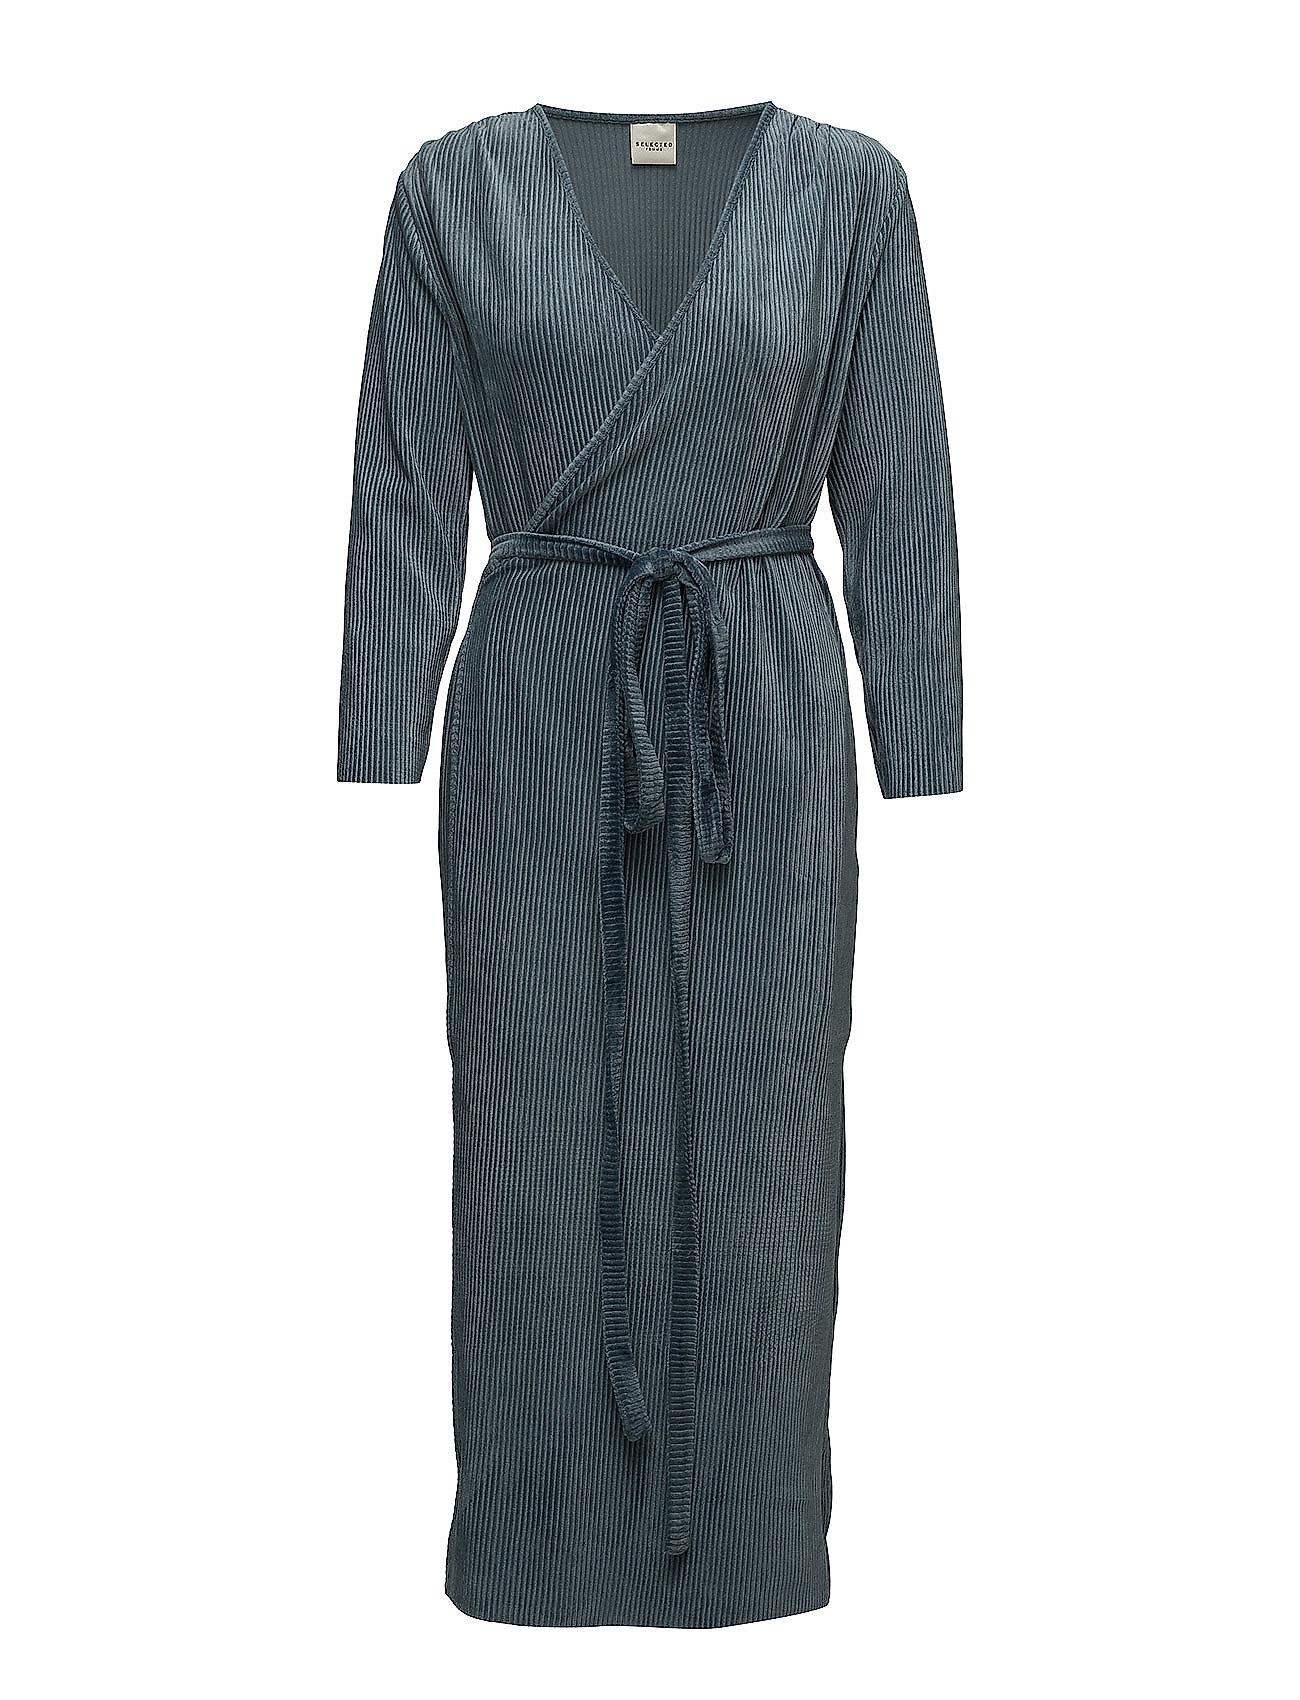 Sfvelva 7/8 Dress Rt Selected Femme Dresses thumbnail